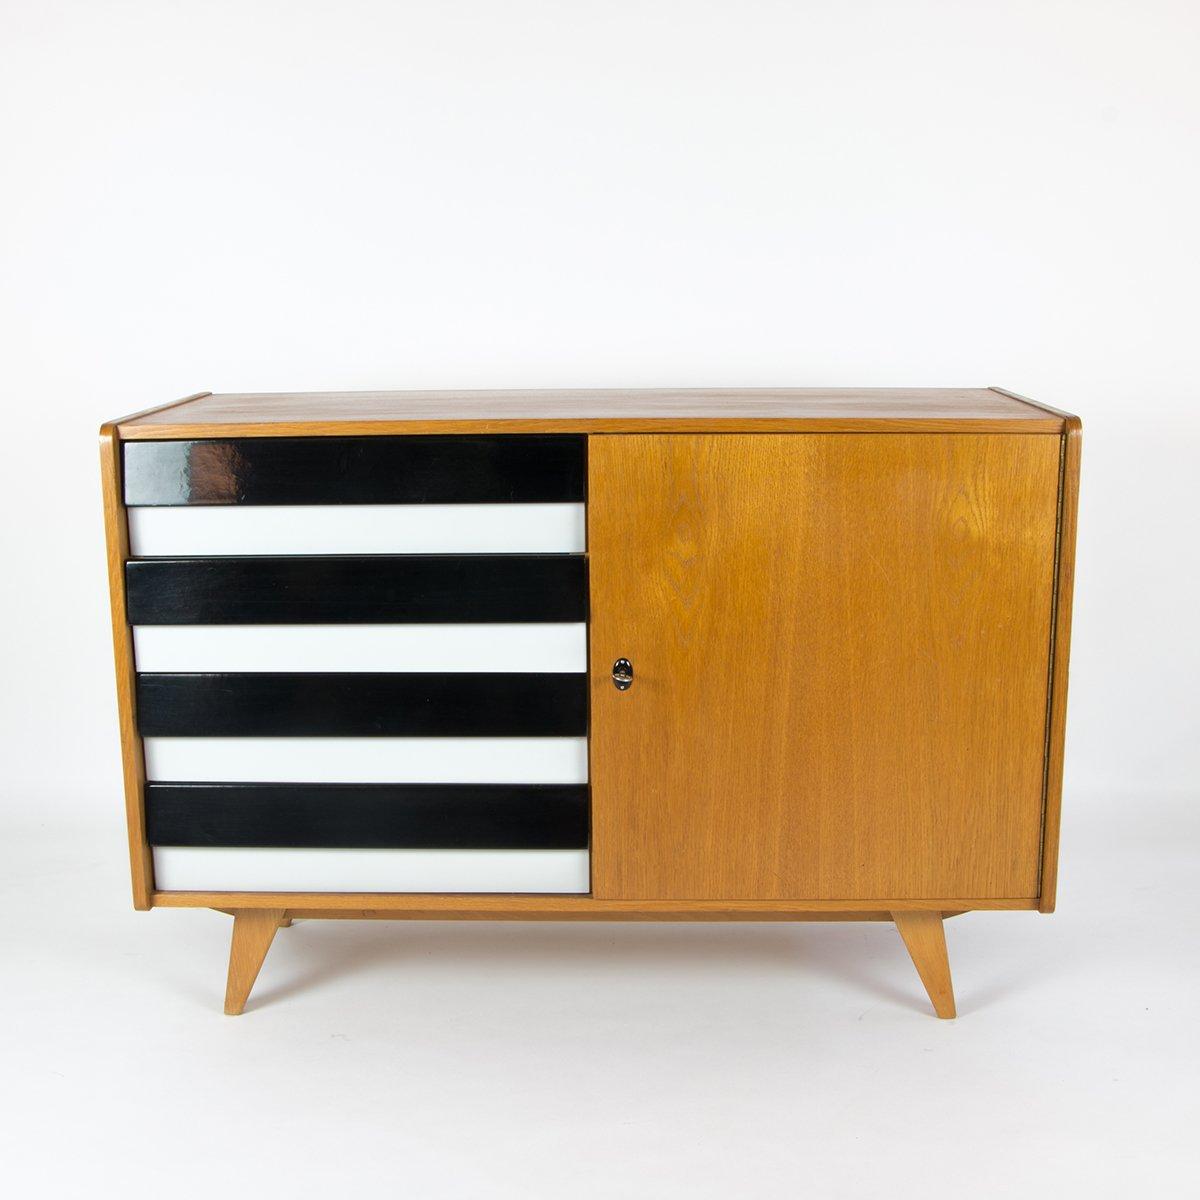 Sideboard von Jiri Jiroutek, 1960er